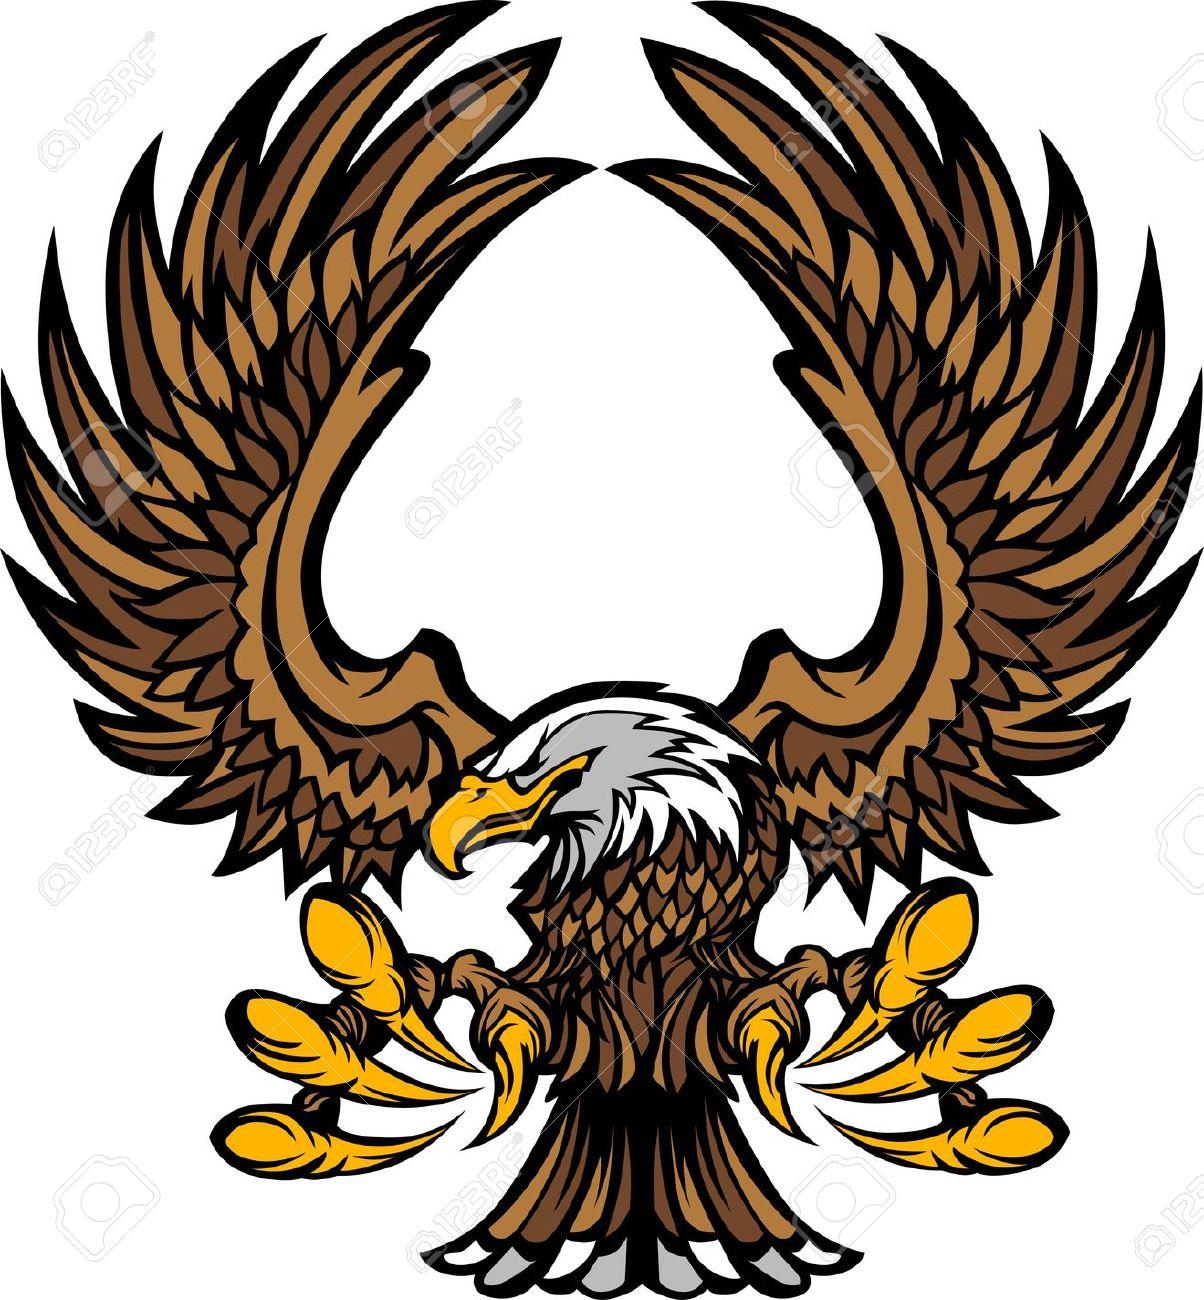 1204x1300 Bald Eagle Clipart Logo Png